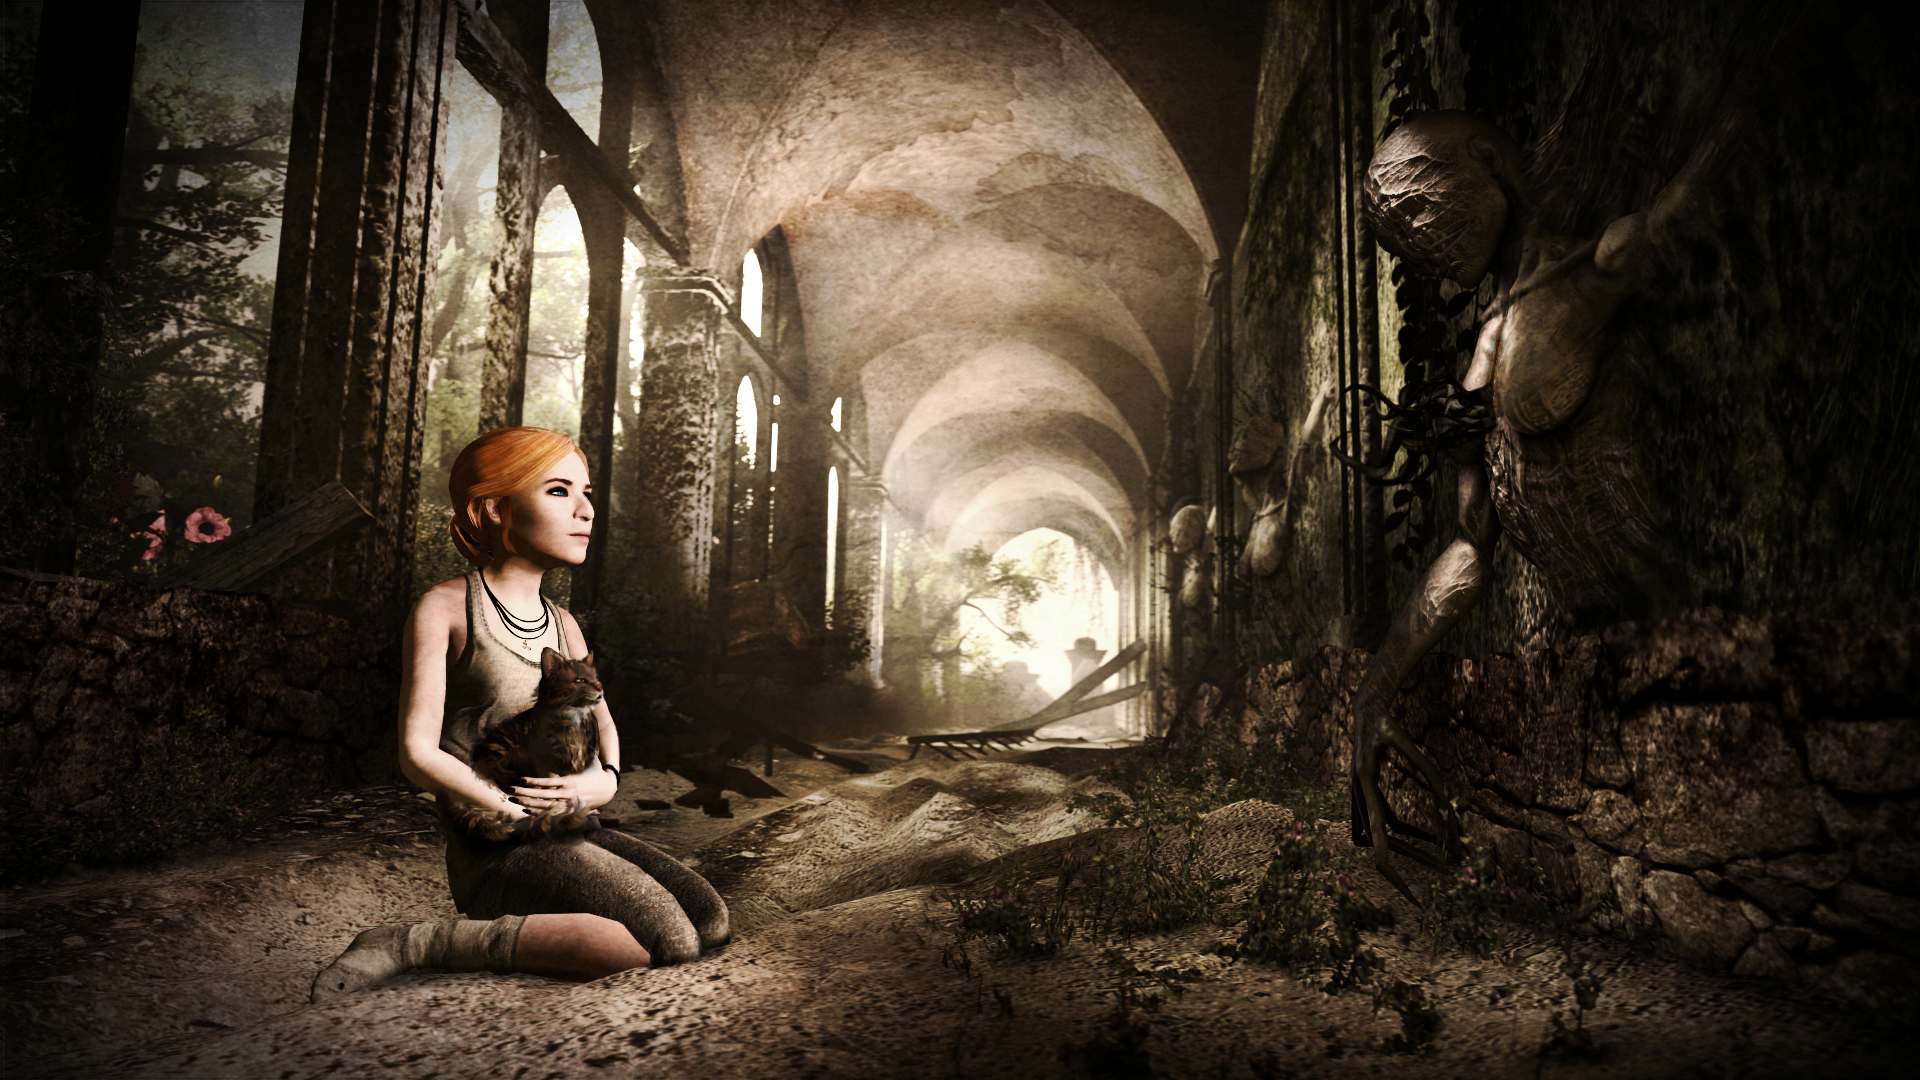 Recollection Passage - Of Secrets